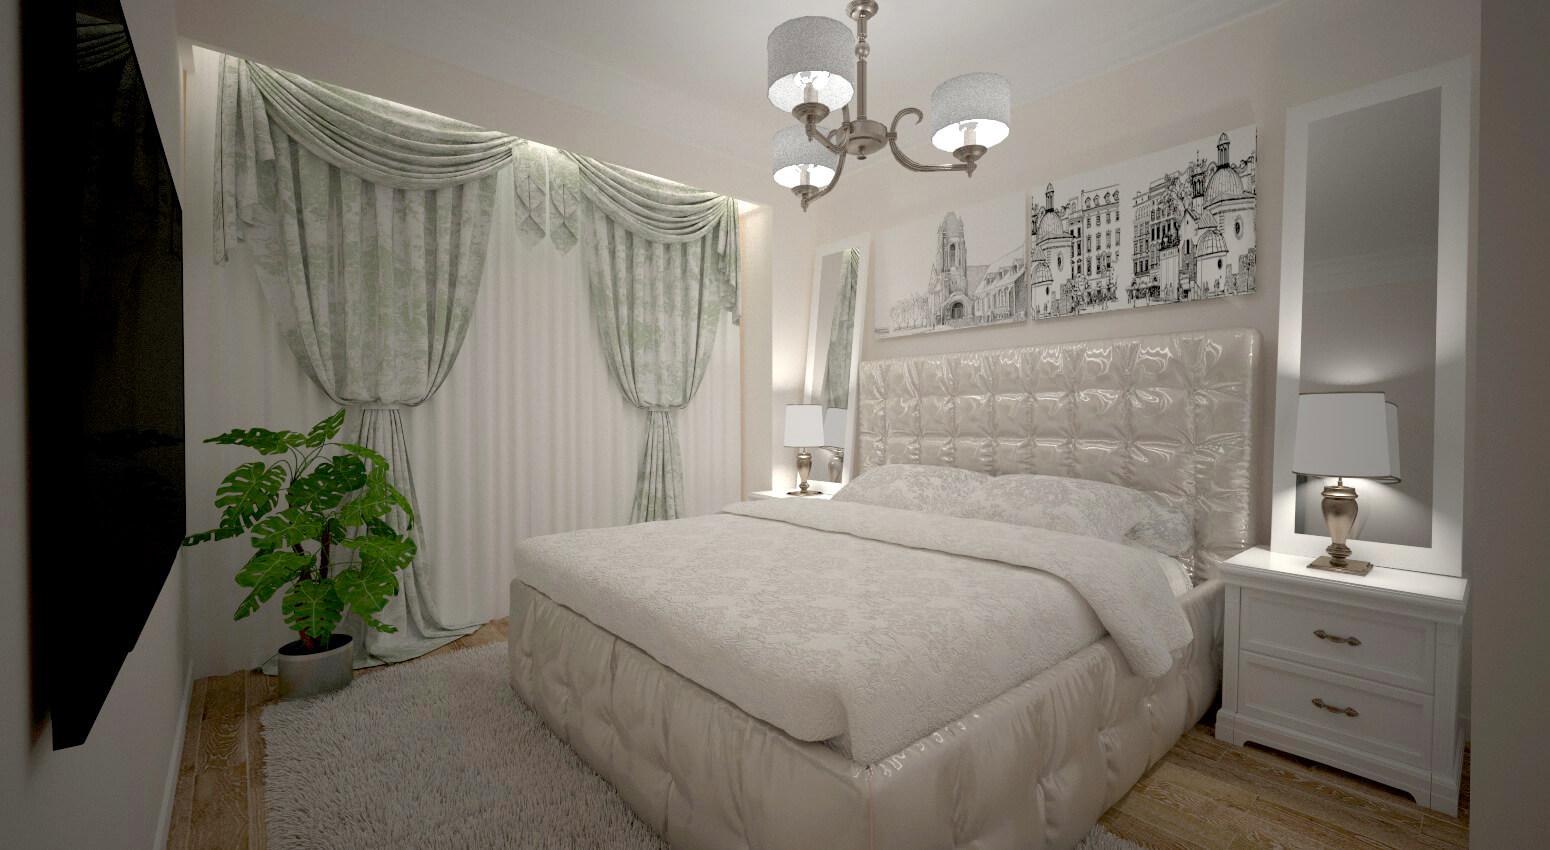 Dormitor apt mare 1